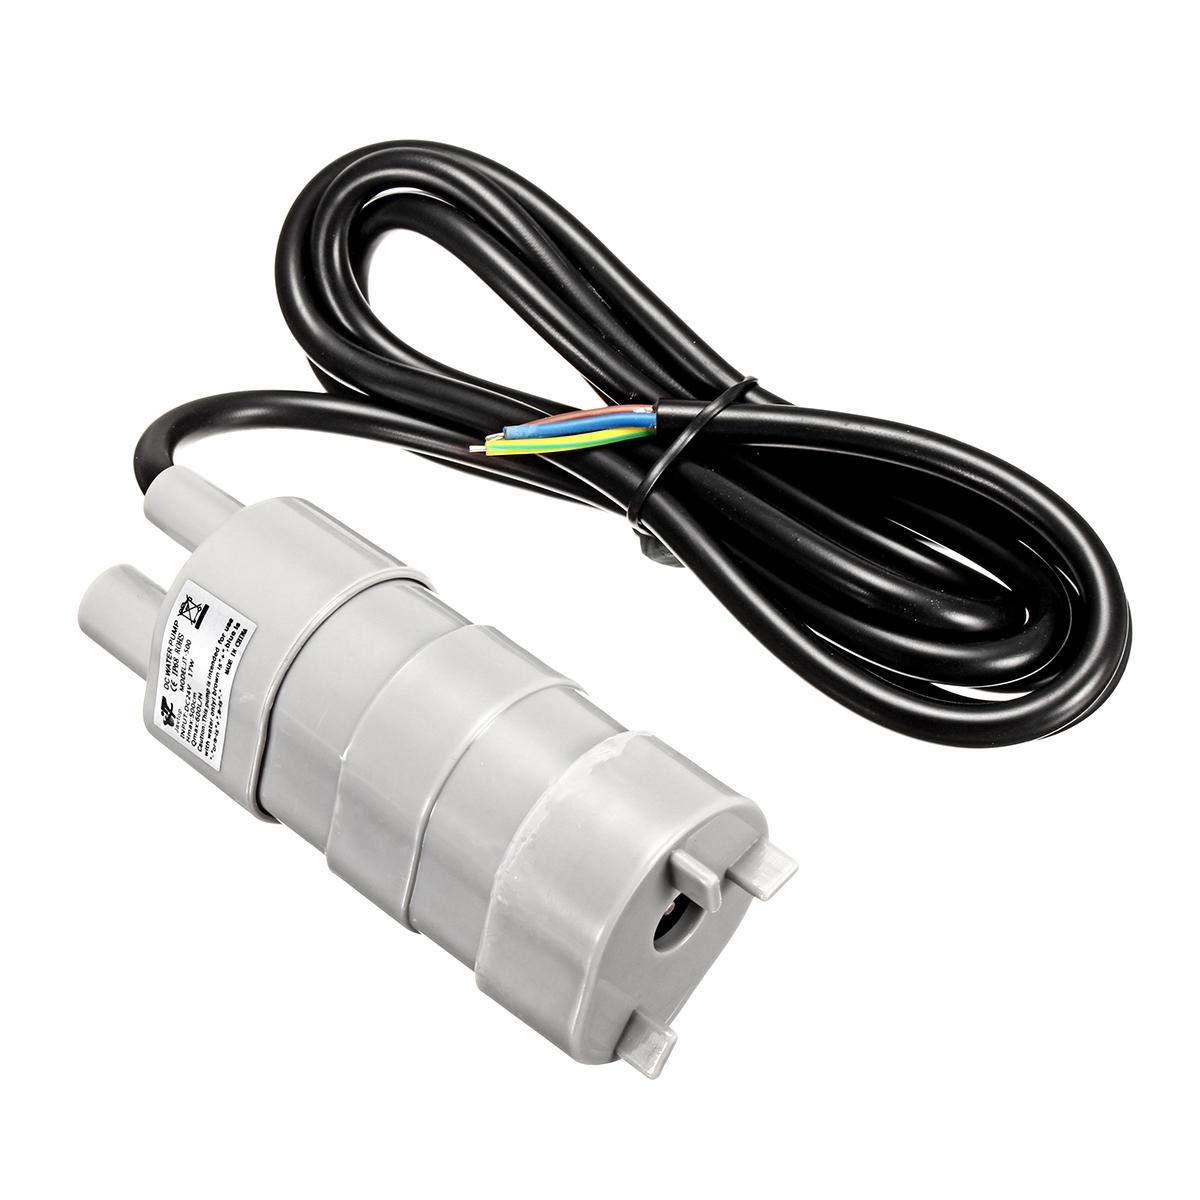 12V//24V DC Submersible Water Pump Mini Water Pump for Cutting Machine 600L//H Max